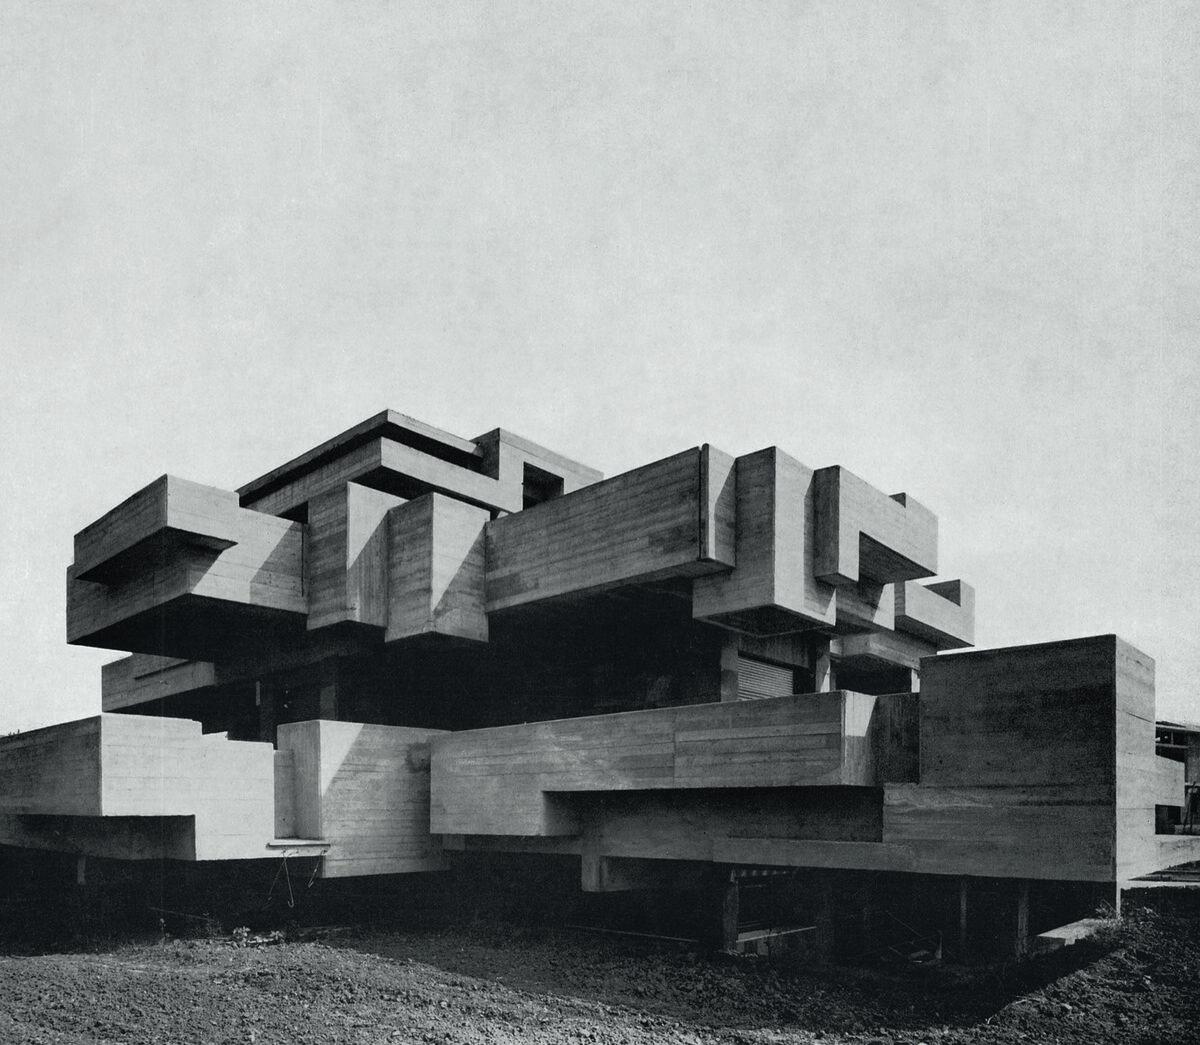 Saverio Busiri Vici, Villa Ronconci, 1973, Rome, Italy. Photo by Saverio Busiri Vici. Courtesy of Phaidon.